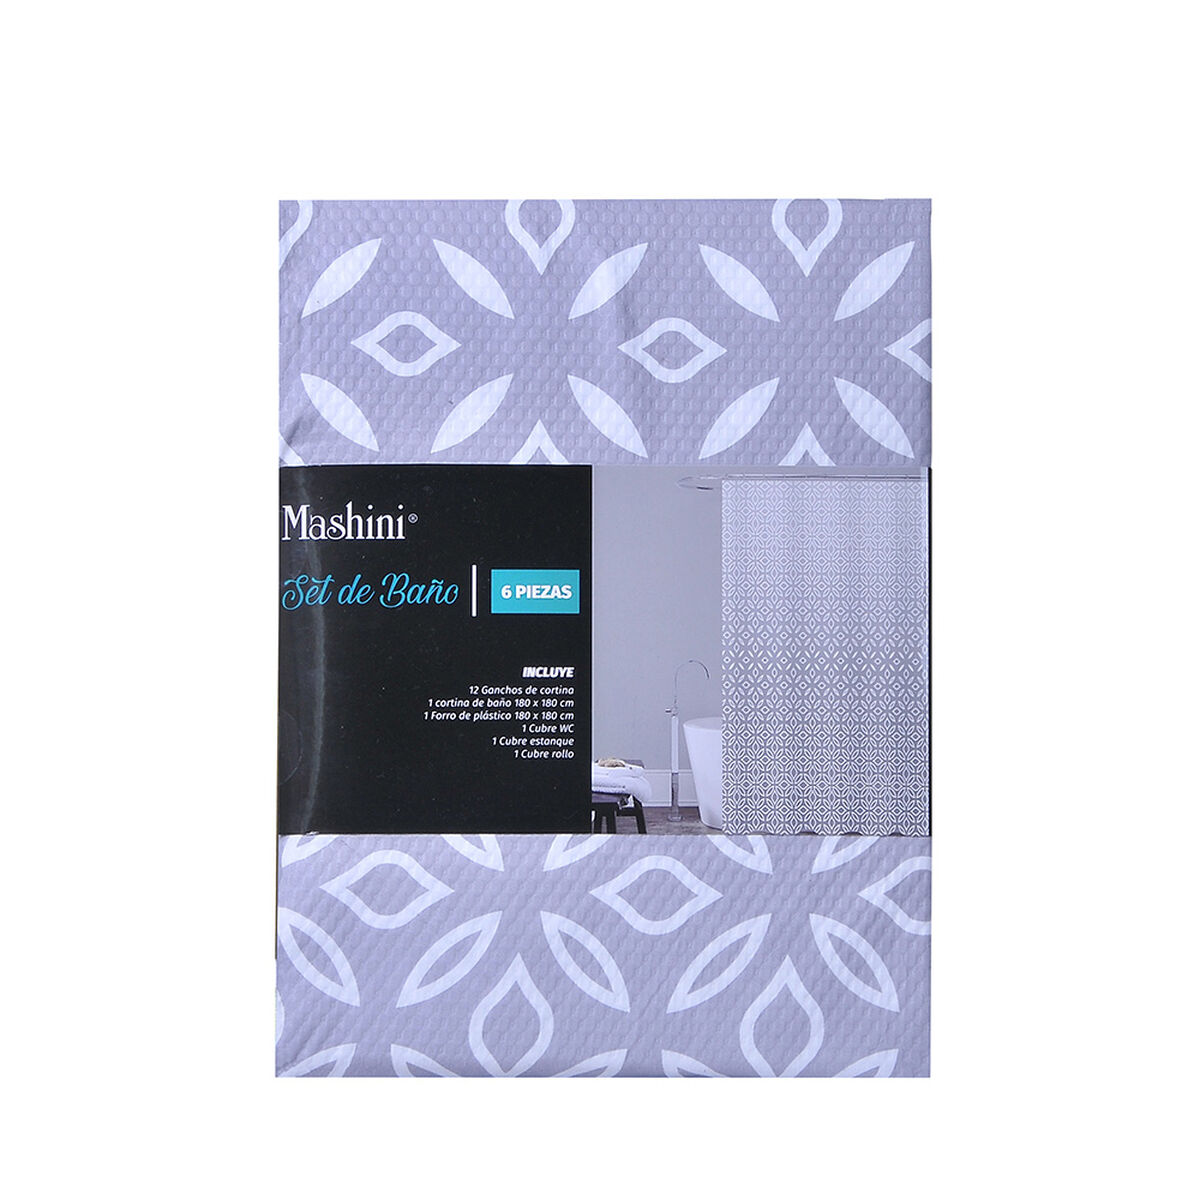 Set Cortina de Baño 6 Piezas Mashini Origami